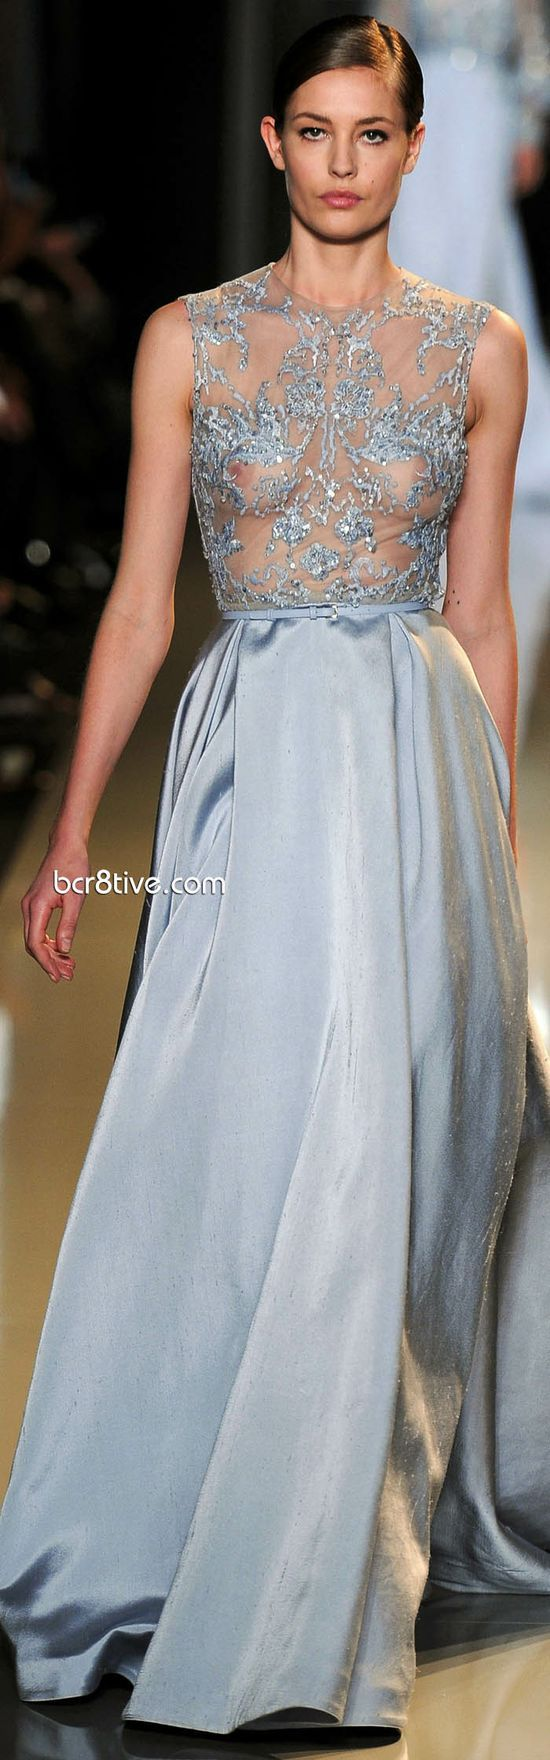 34 best Elie Saab images on Pinterest | Wedding frocks, Homecoming ...